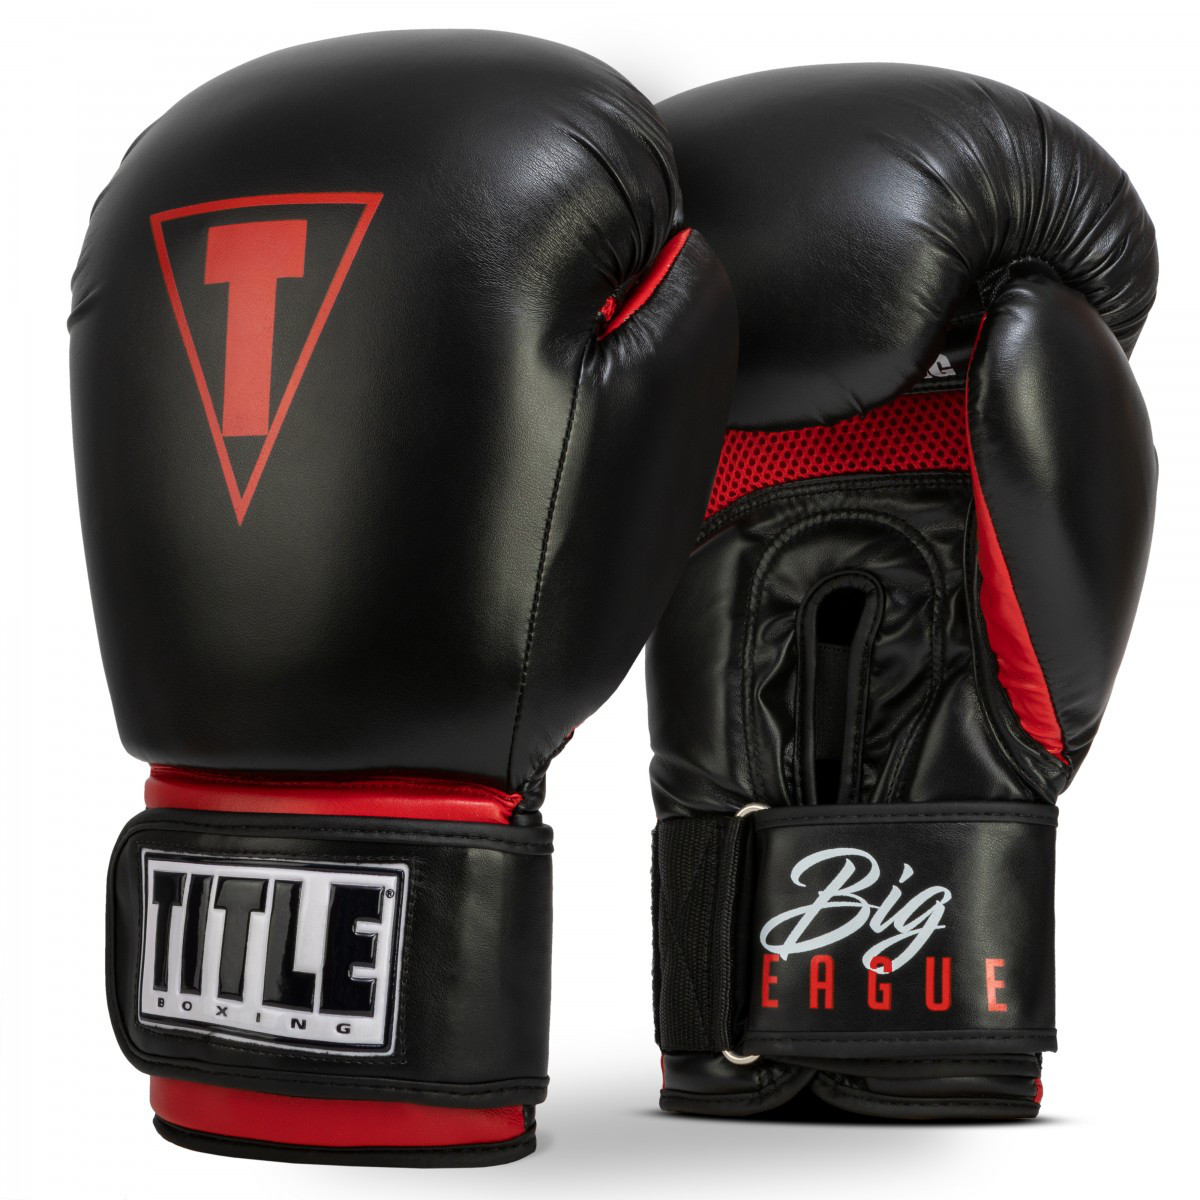 Боксерські рукавички TITLE Big League XXL Bag Gloves